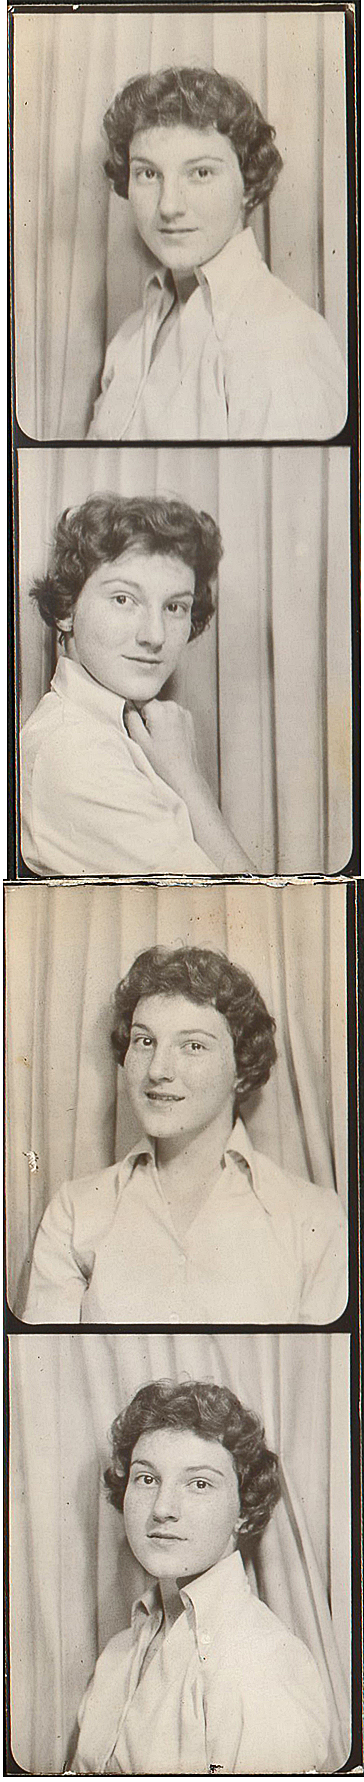 Jessie Elaine Wallace